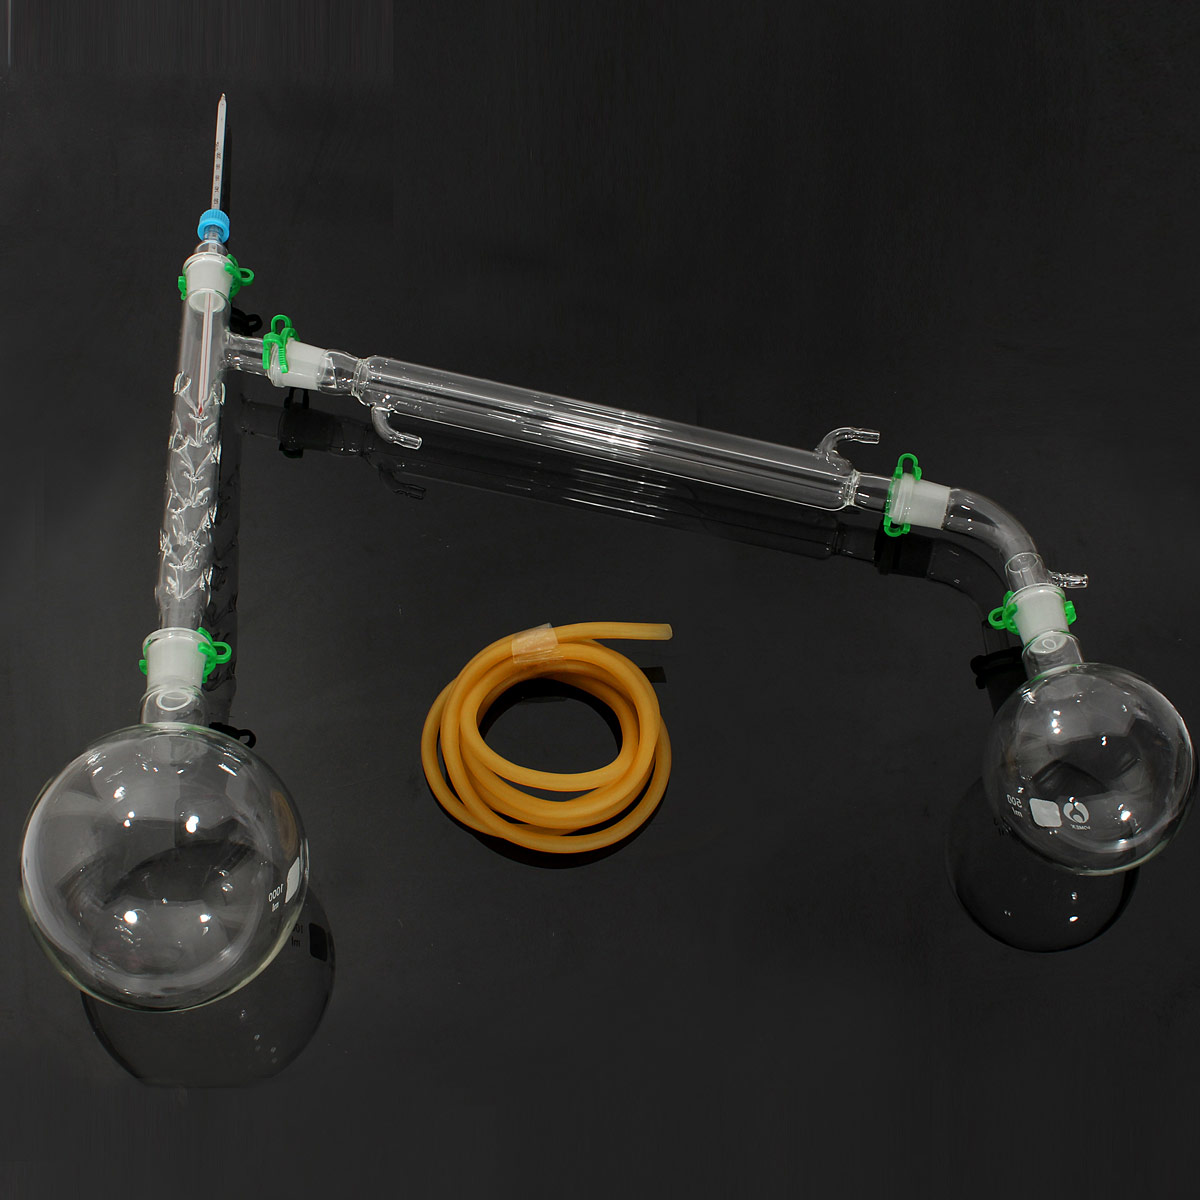 Efficient 1000ml Distillation Apparatus Laboratory Glassware Kit Set Chemistry Lab Glass Distilling Distillation Apparatus 24/29